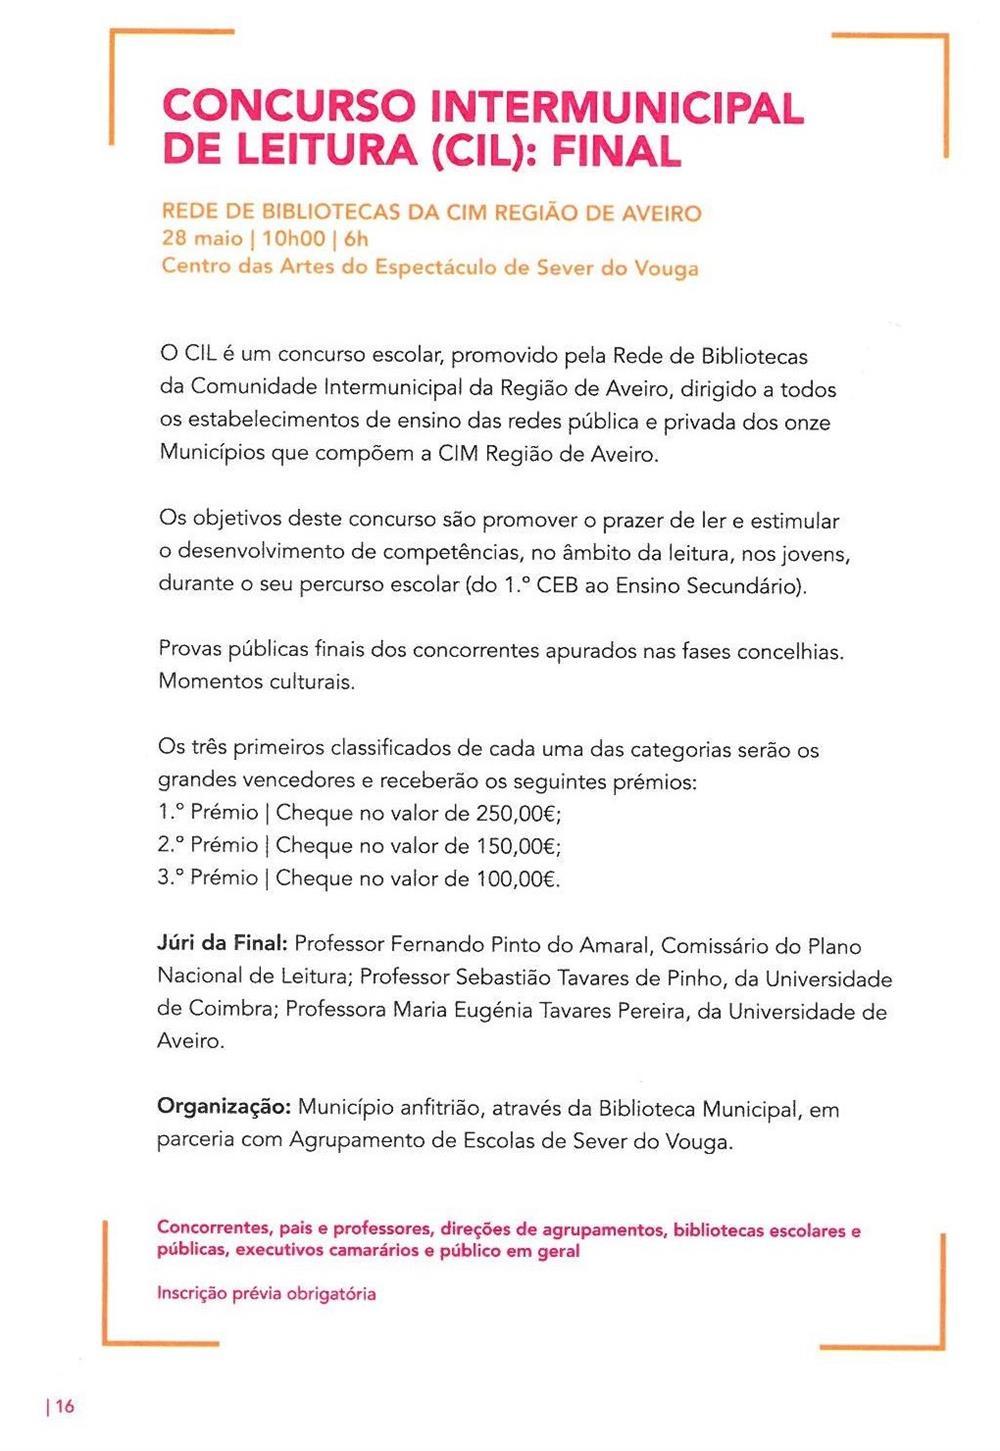 ACMSV-abr.,maio,jun.,jul.'16-p.16-Concurso Intermunicipal de Leitura : CIL : final.jpg